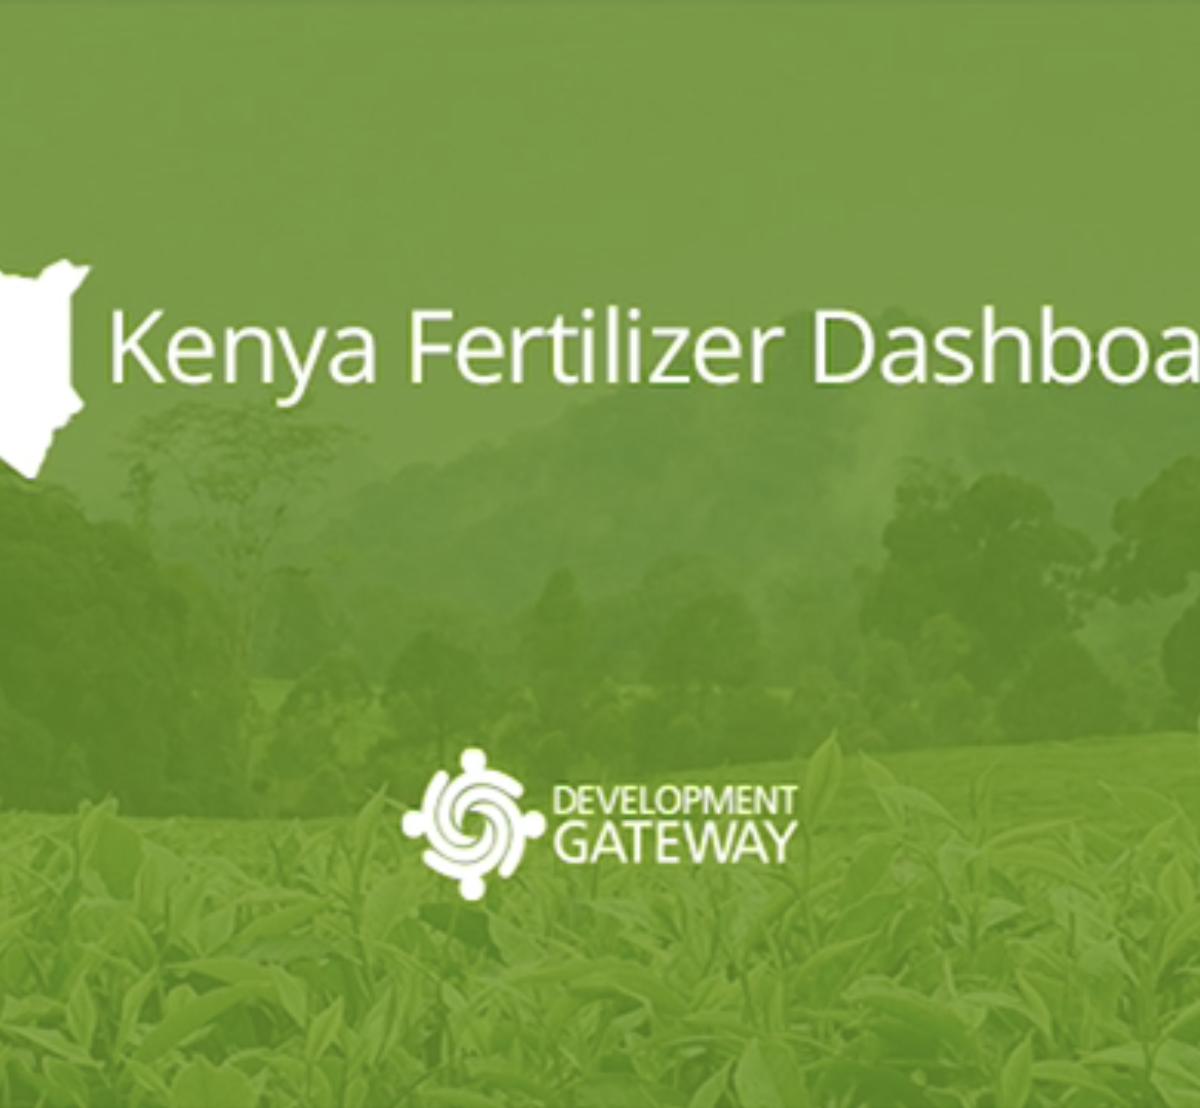 Kenya Fertilizer Dashboard